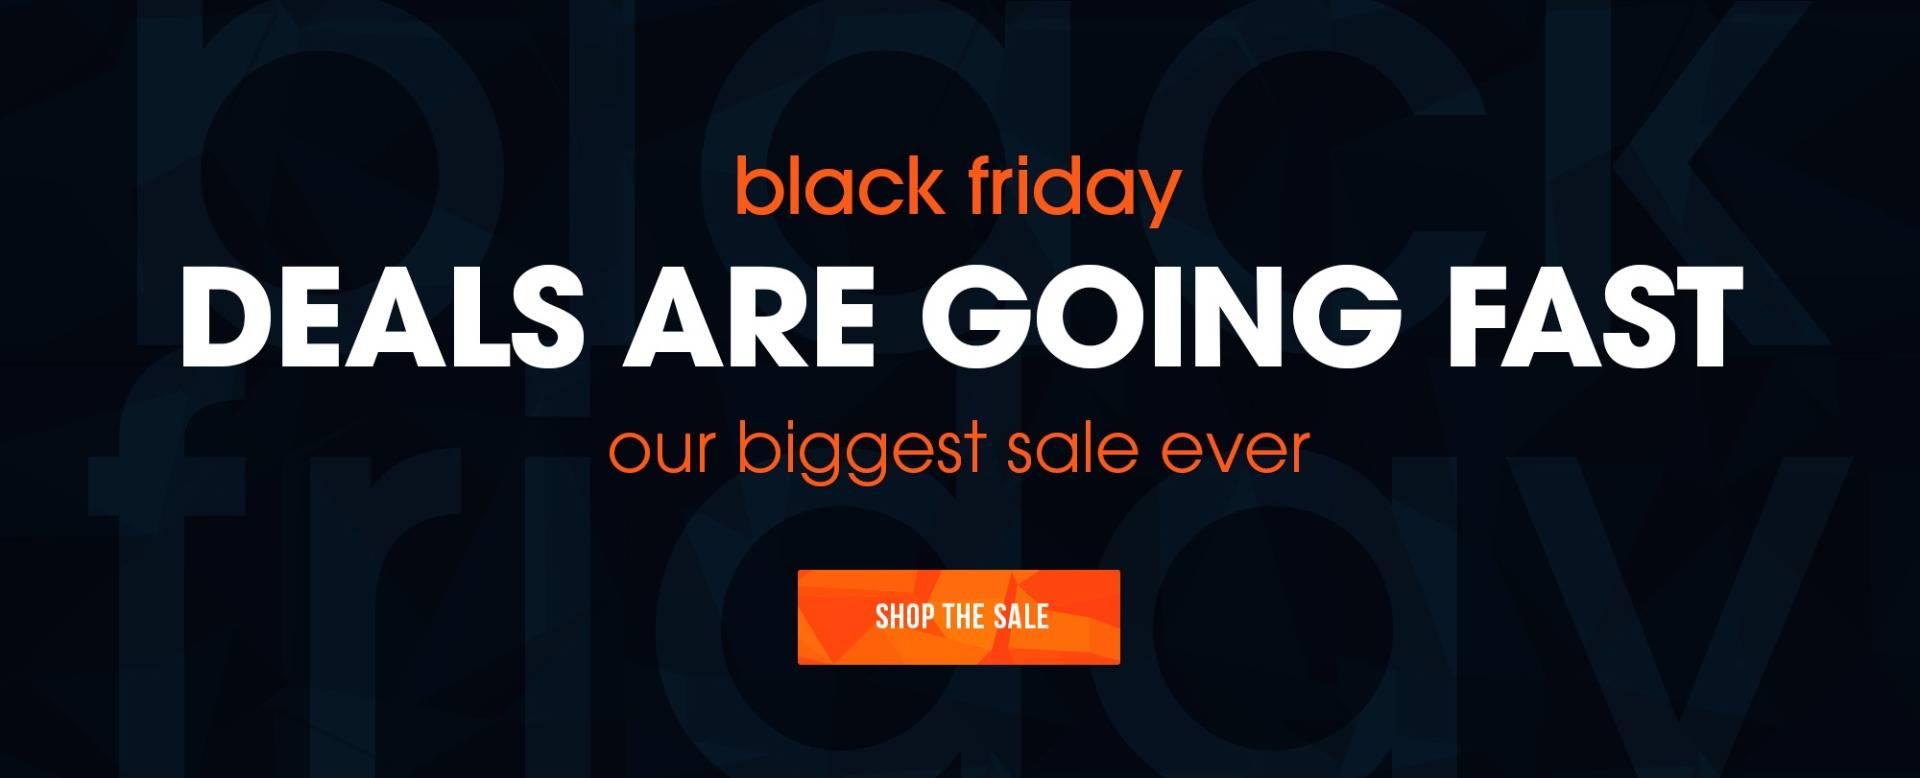 Black Friday Deals - Our Biggest Sale Ever